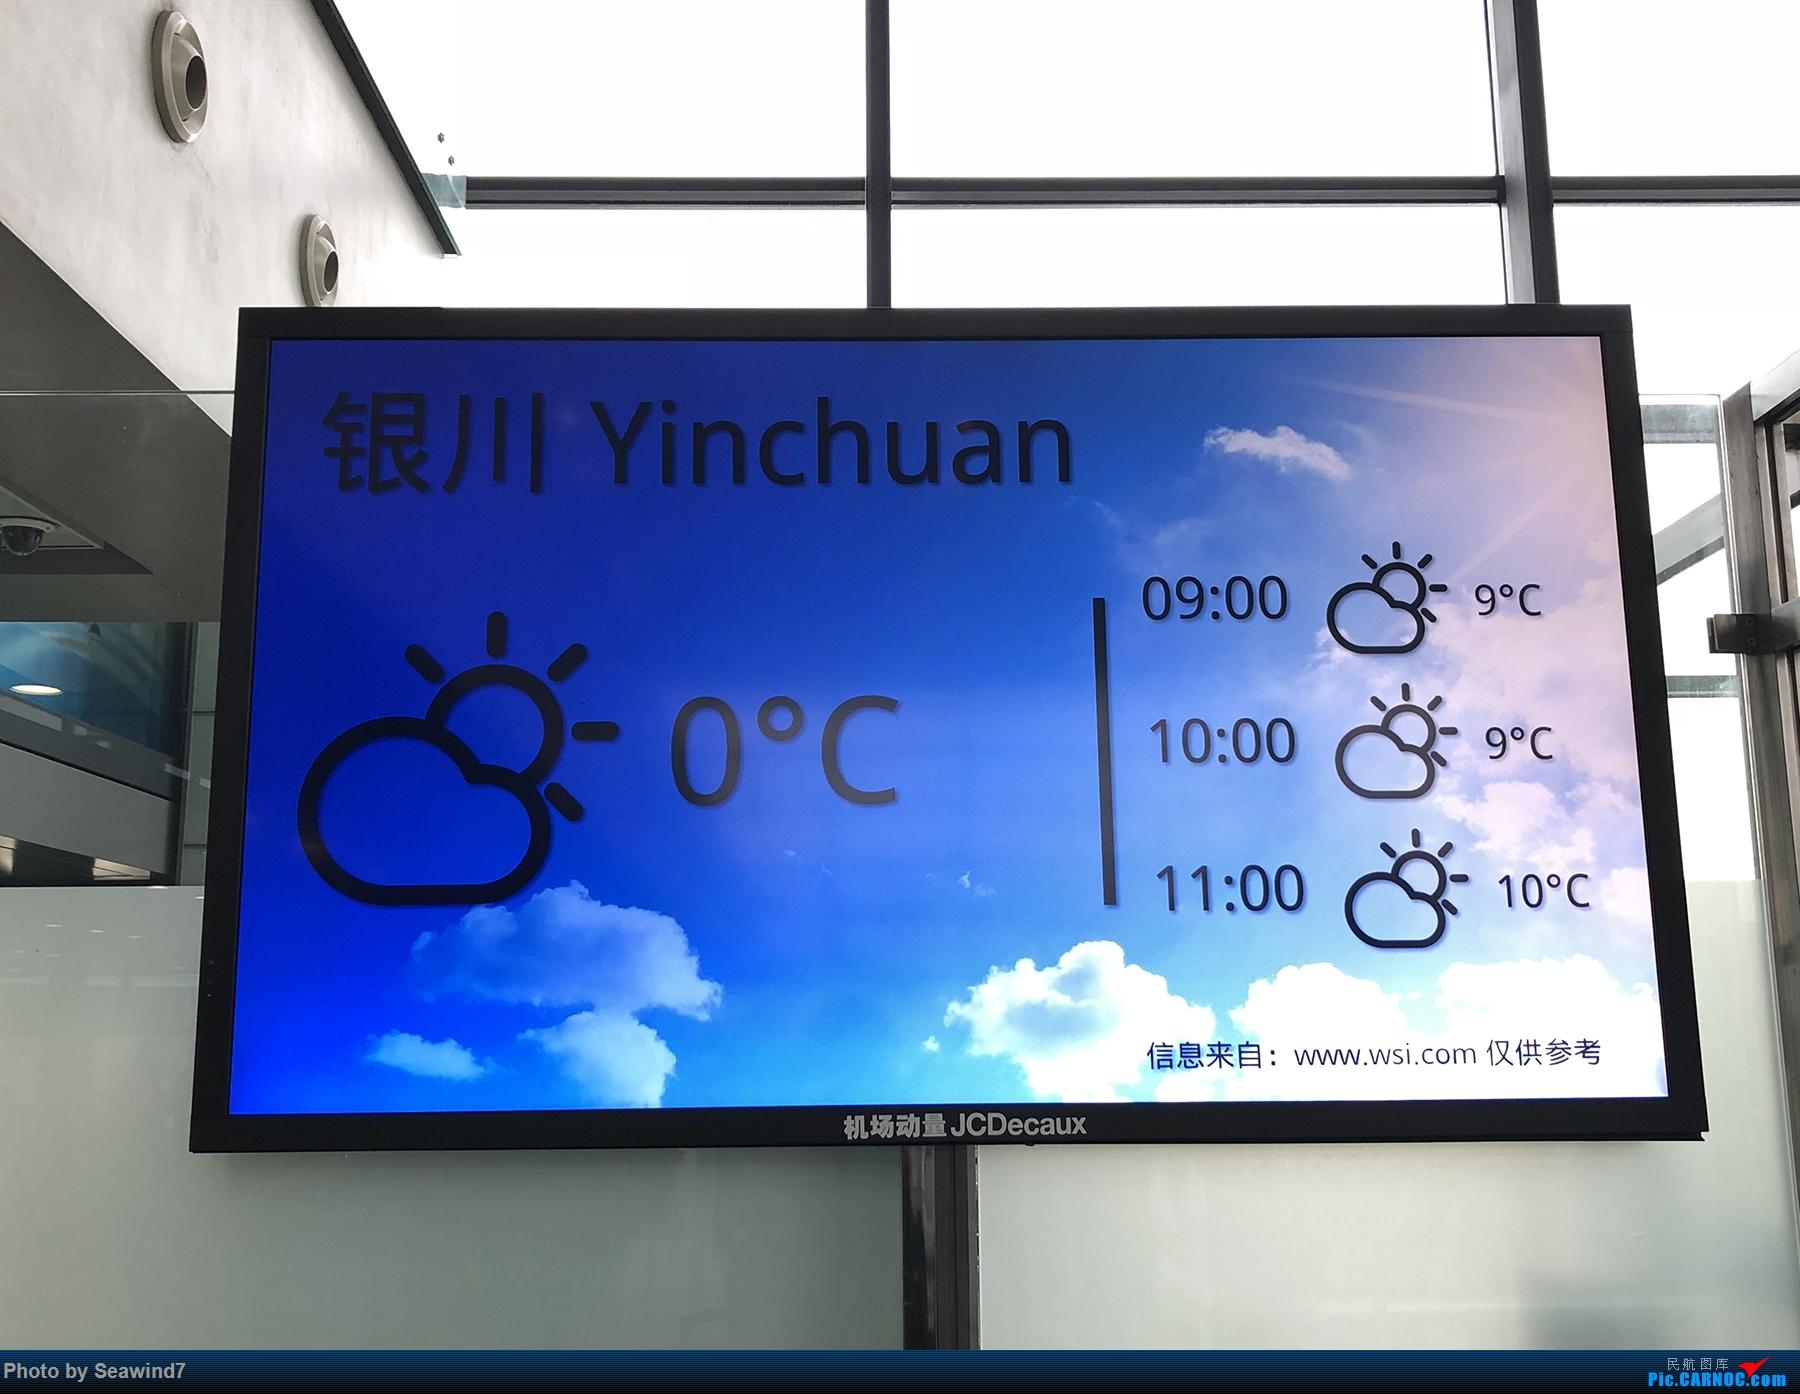 Re:[原创][Seawind7游记第五弹]银川neo往返    中国上海虹桥国际机场